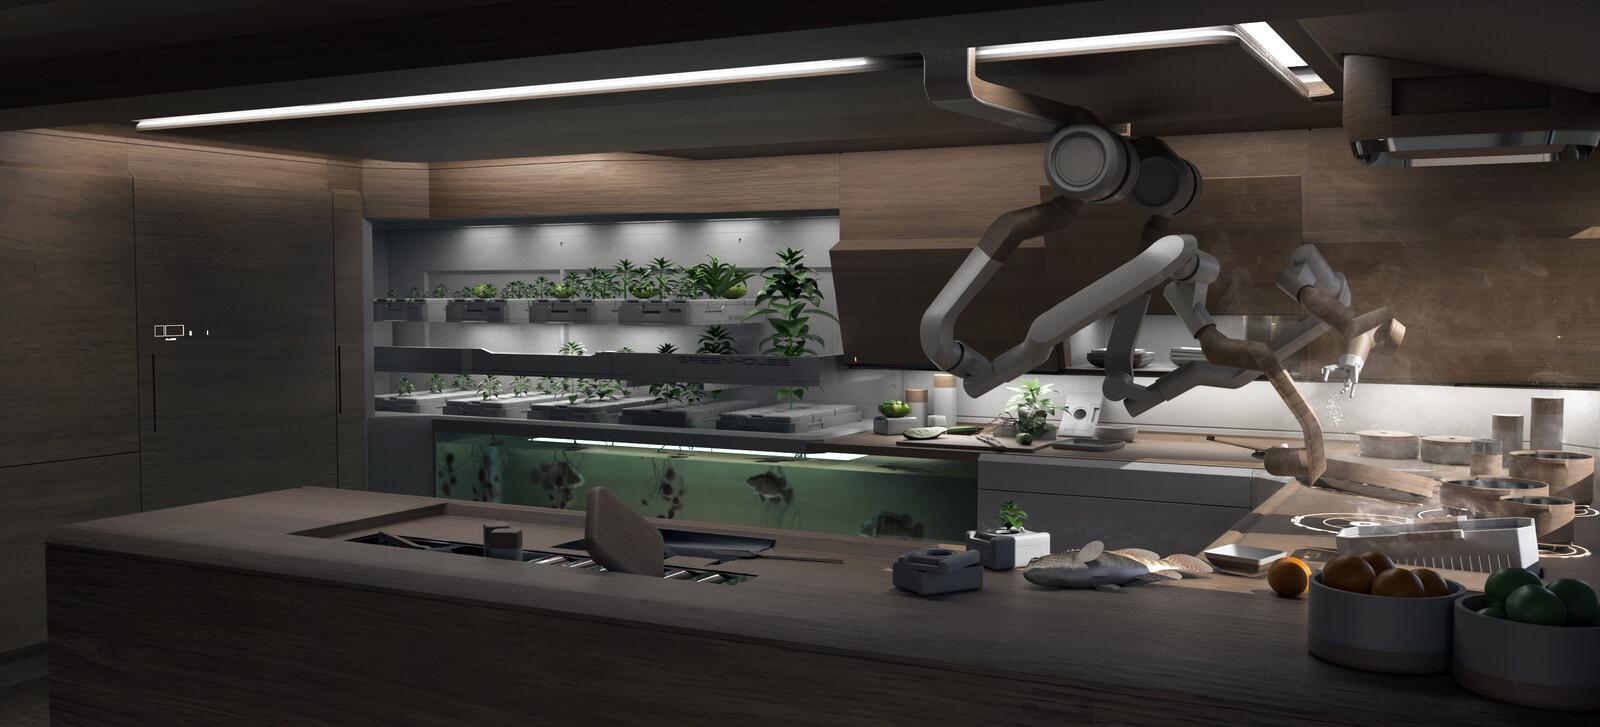 NVIDIA Metropia 2042 Interiors of the Future